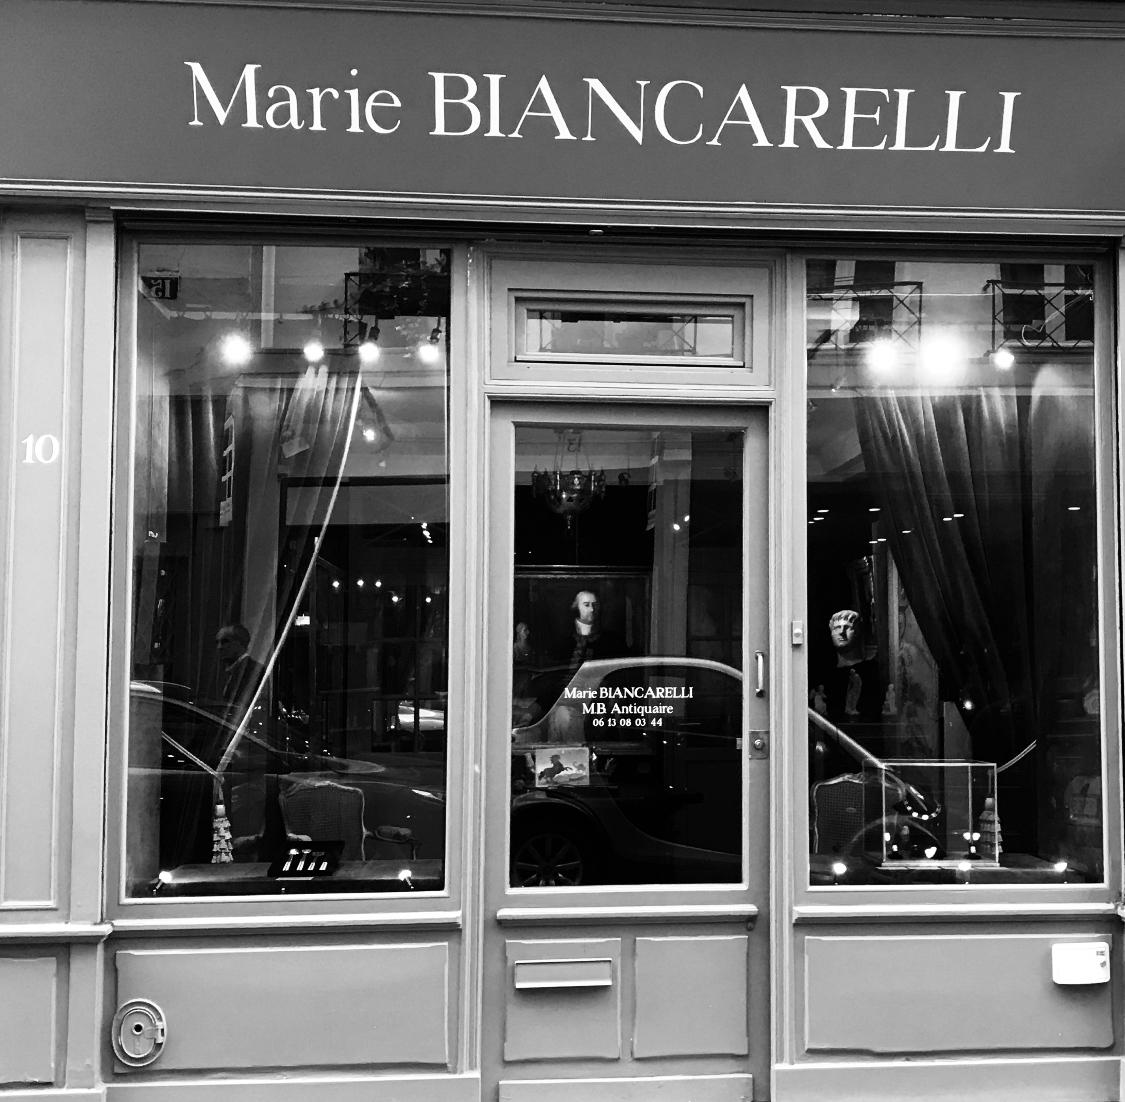 Marie Biancarelli